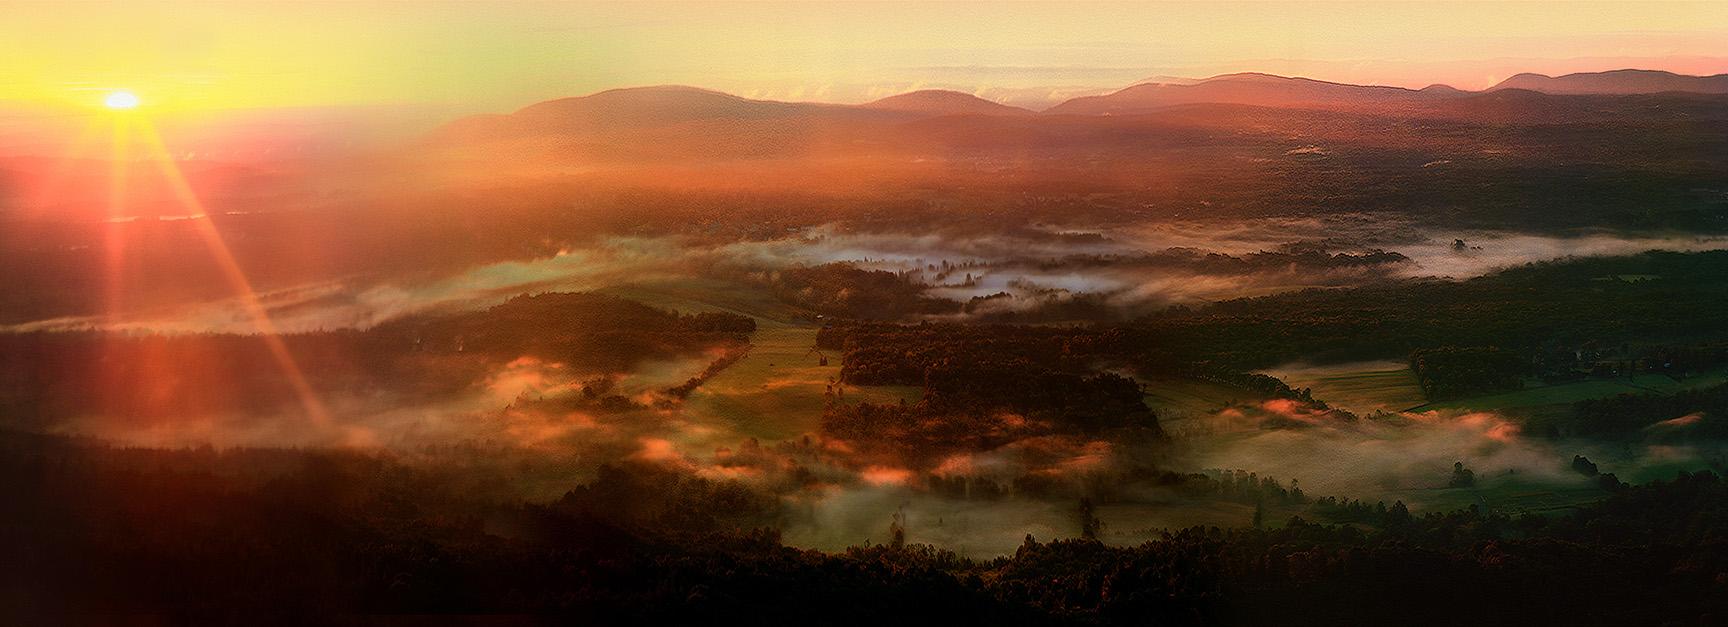 Wallkill Valley Sunset